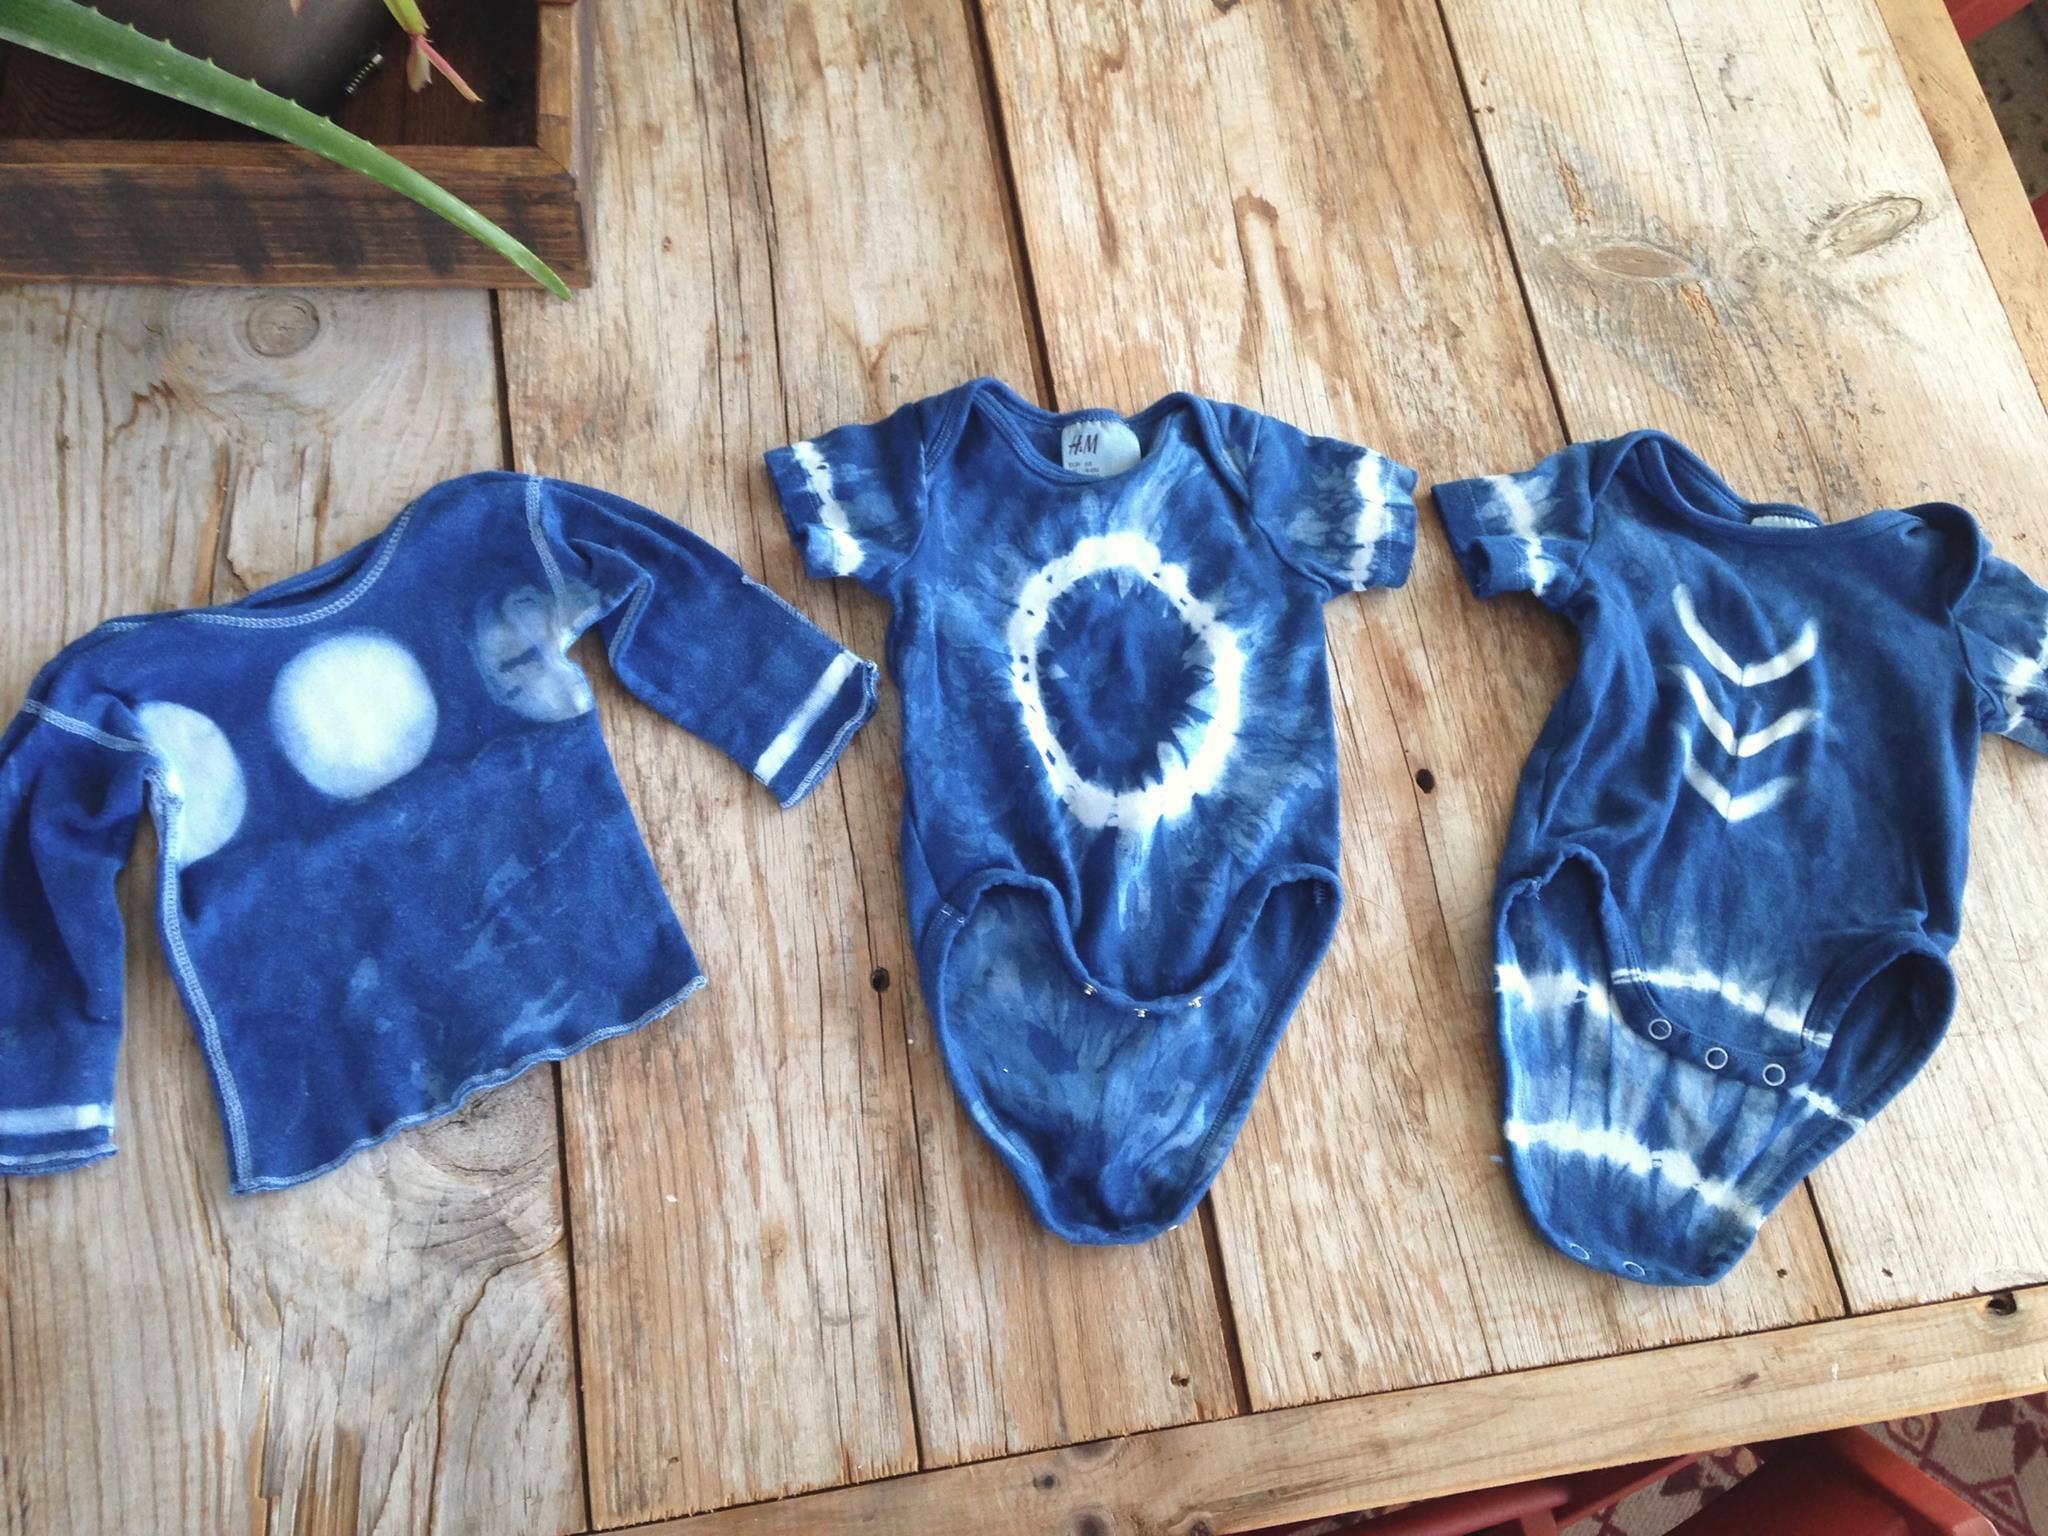 indigo dyed baby gear.jpg